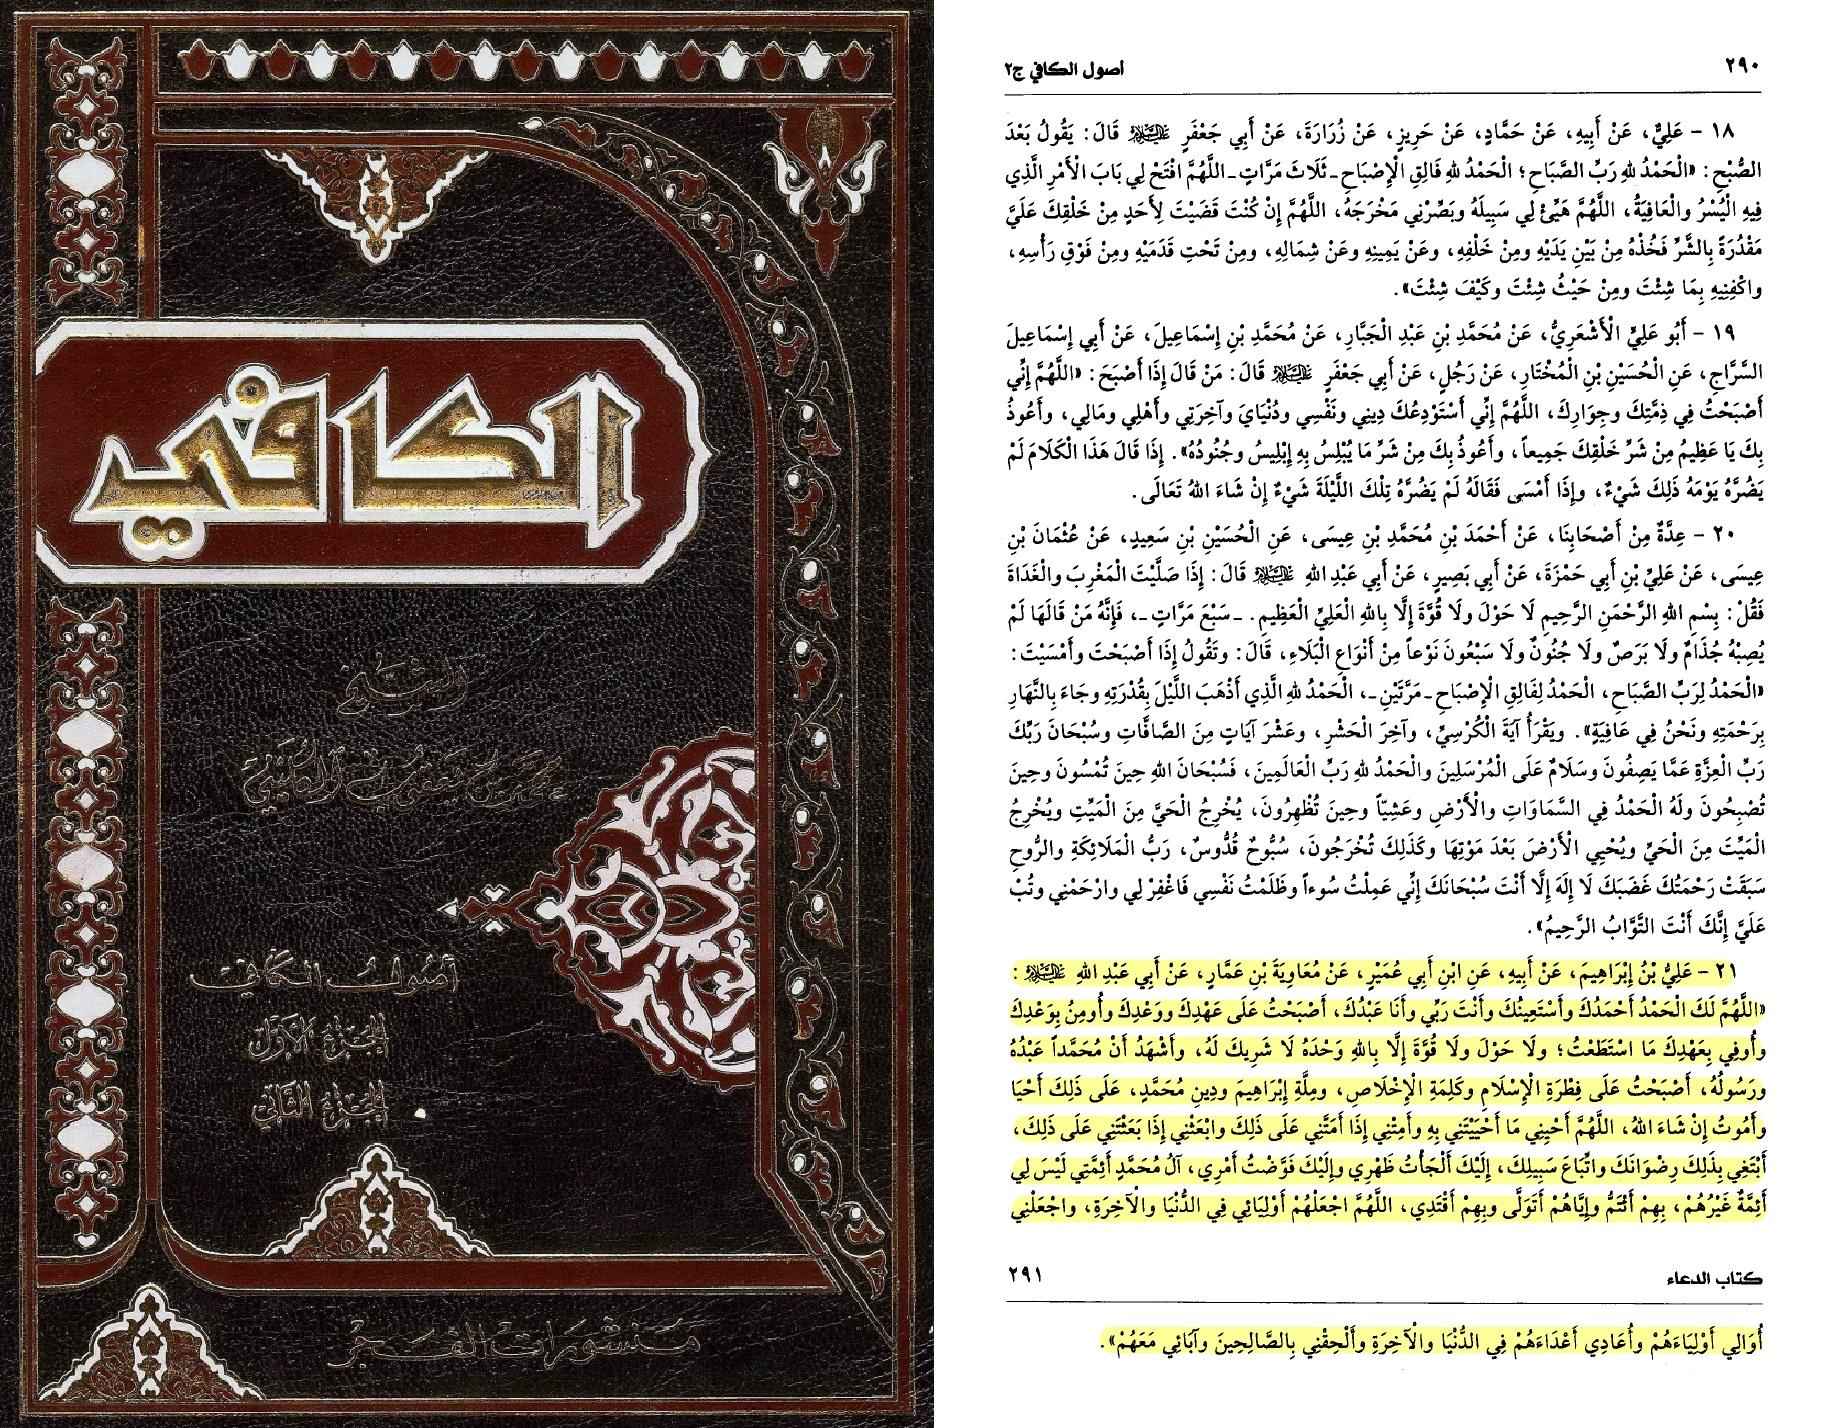 sa7i7-e-kolaini-band-2-seite-290-291-hadith-21